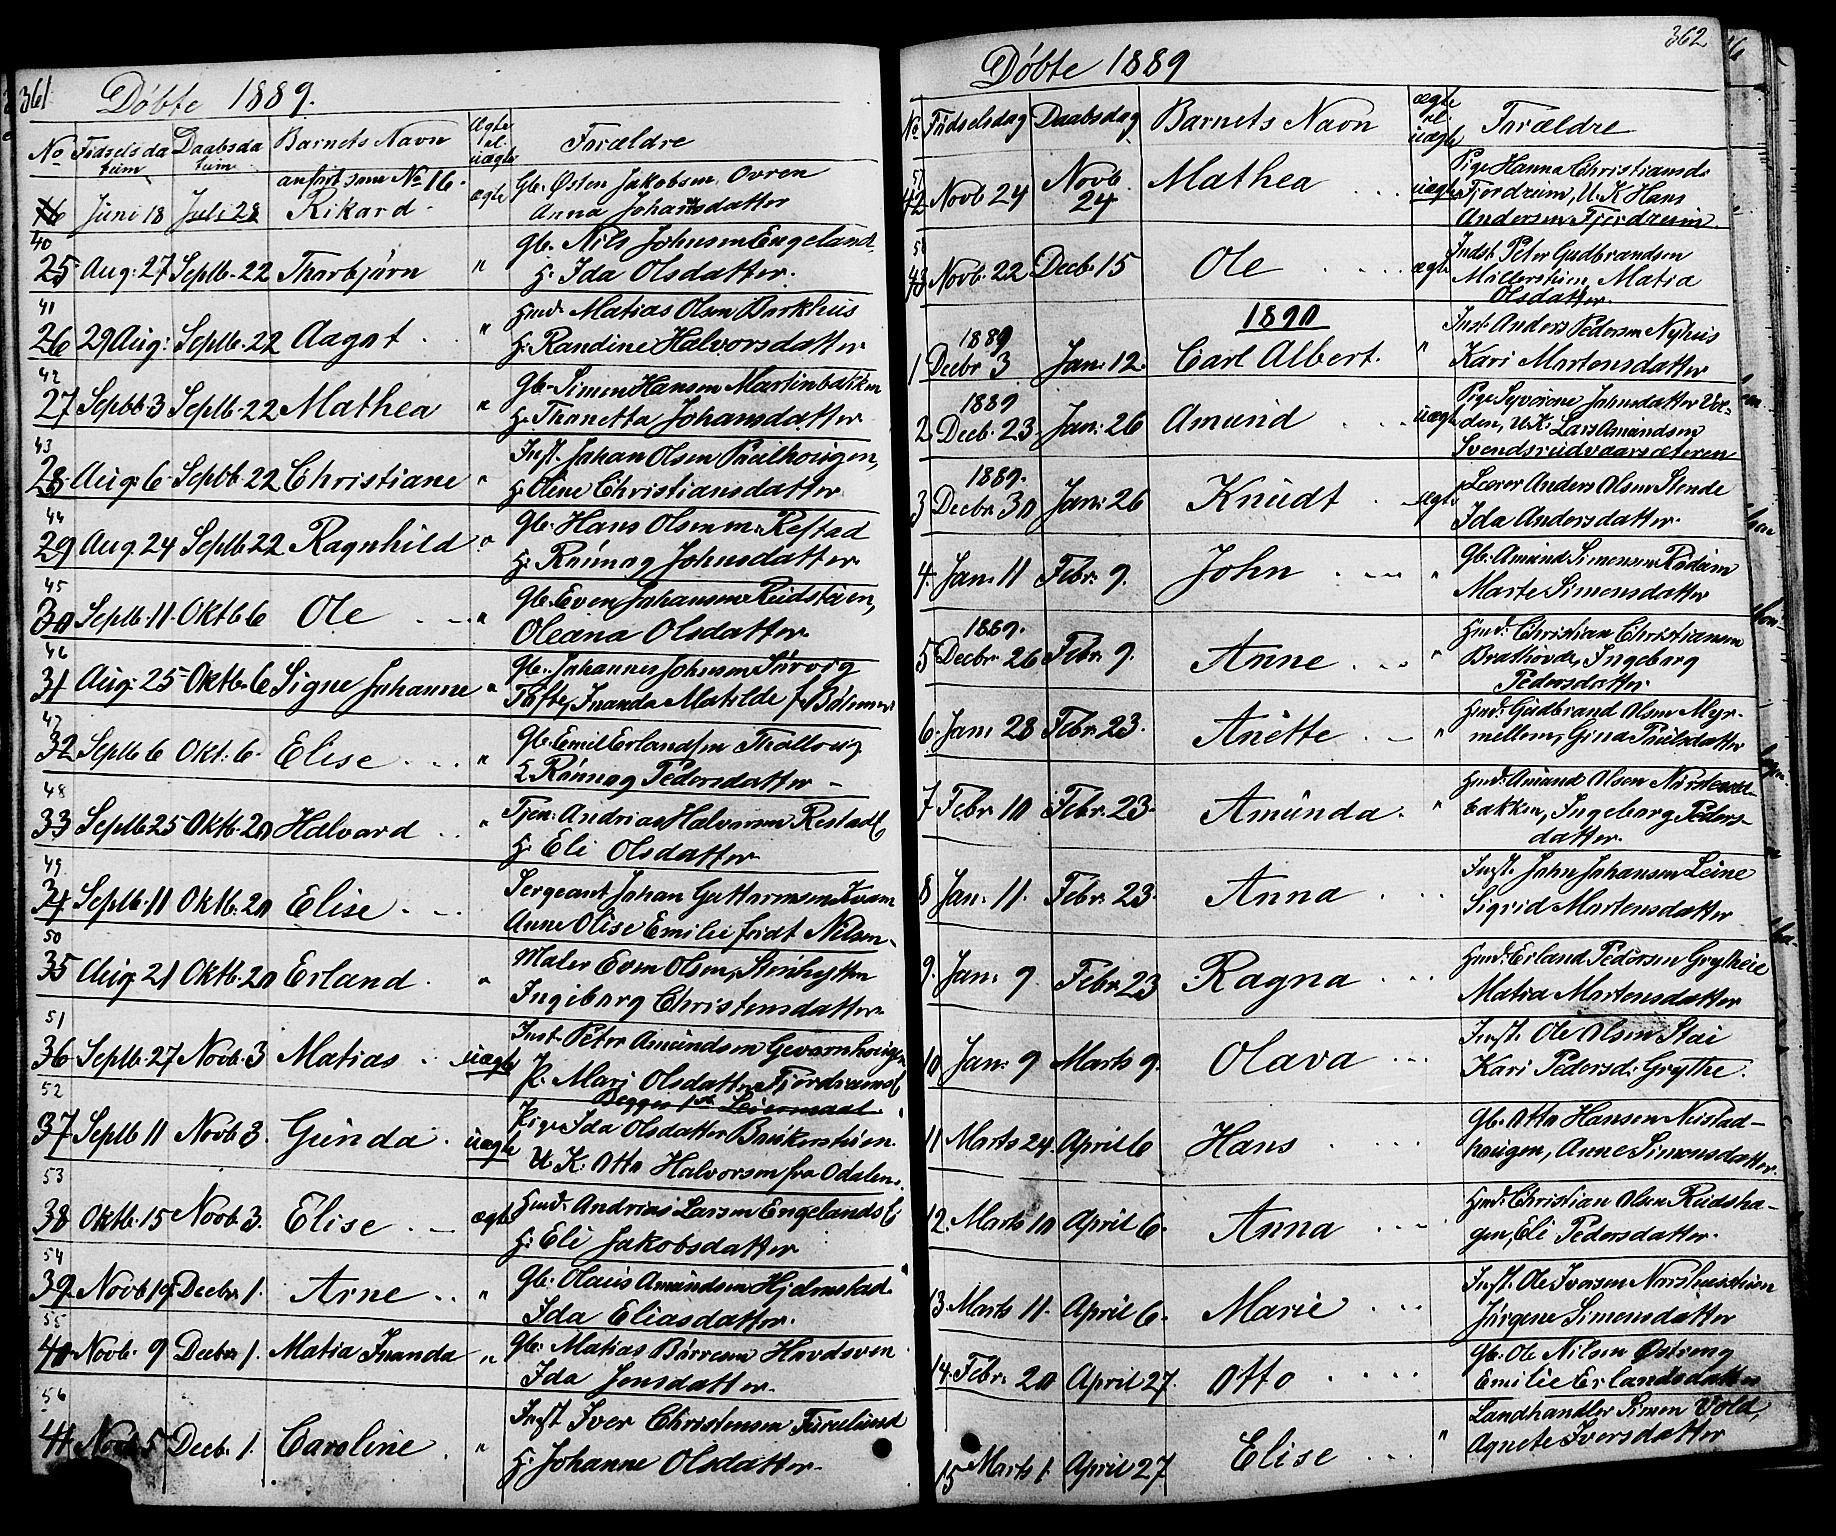 SAH, Østre Gausdal prestekontor, Klokkerbok nr. 1, 1863-1893, s. 361-362